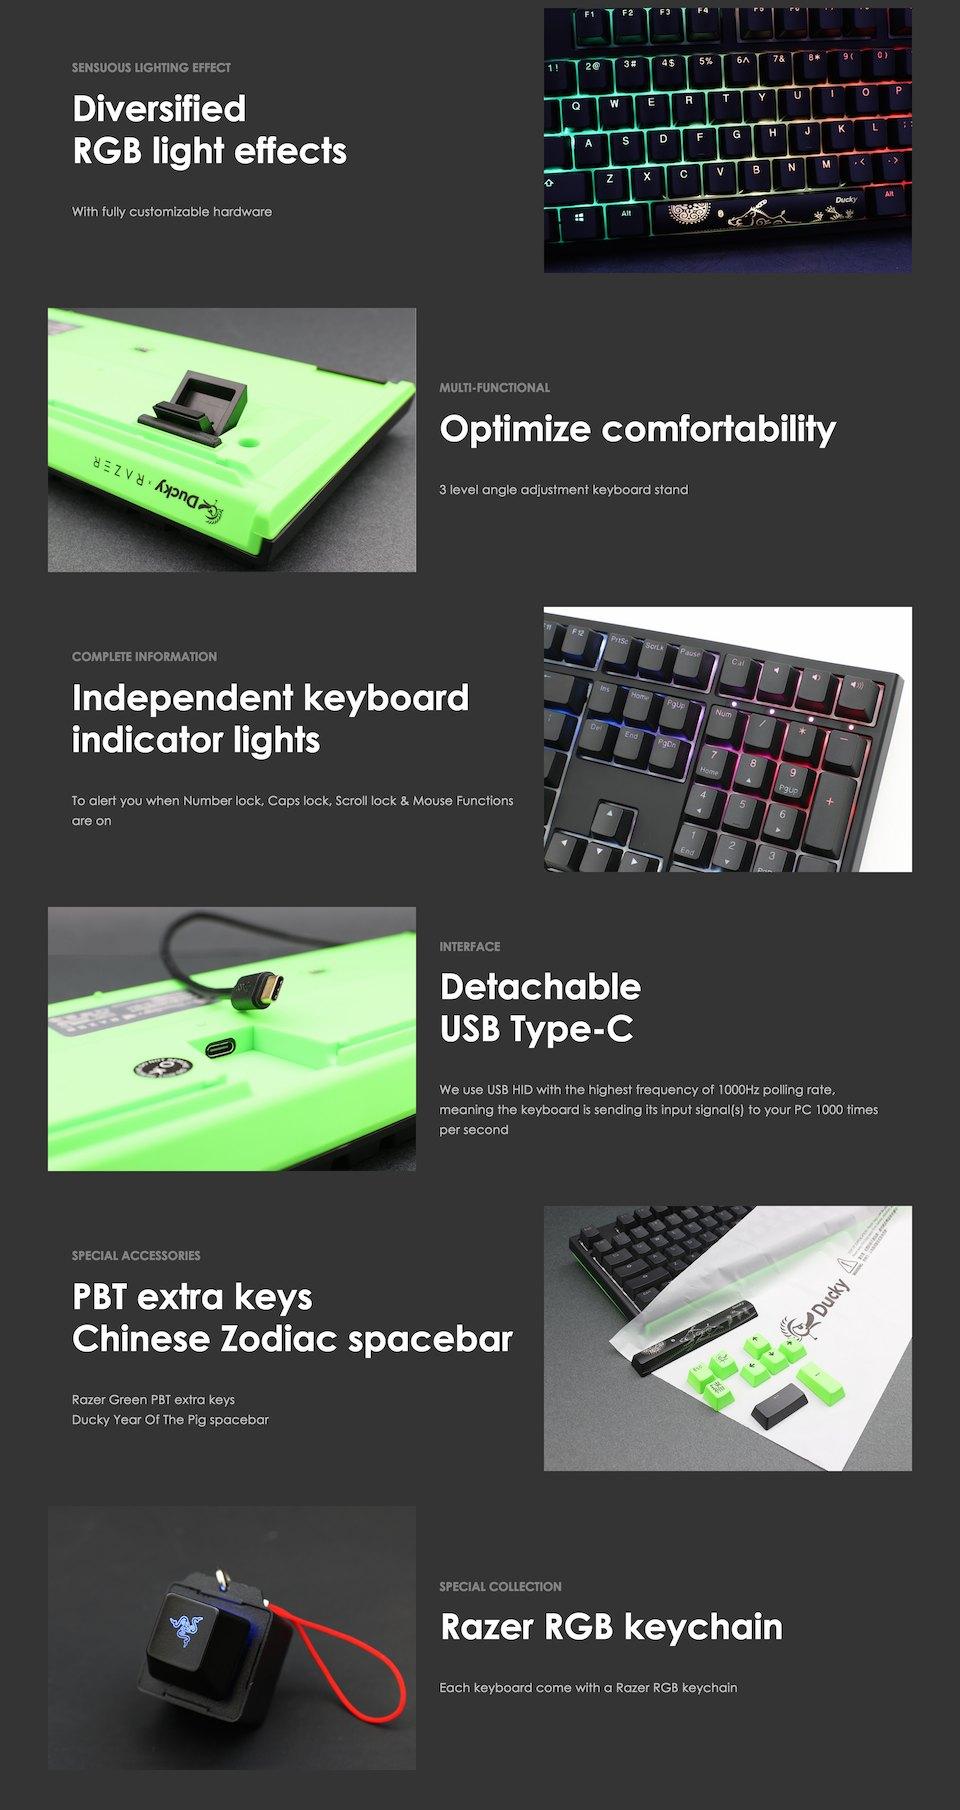 Ducky One 2 Razer Edition RGB Mechanical Keyboard Green features